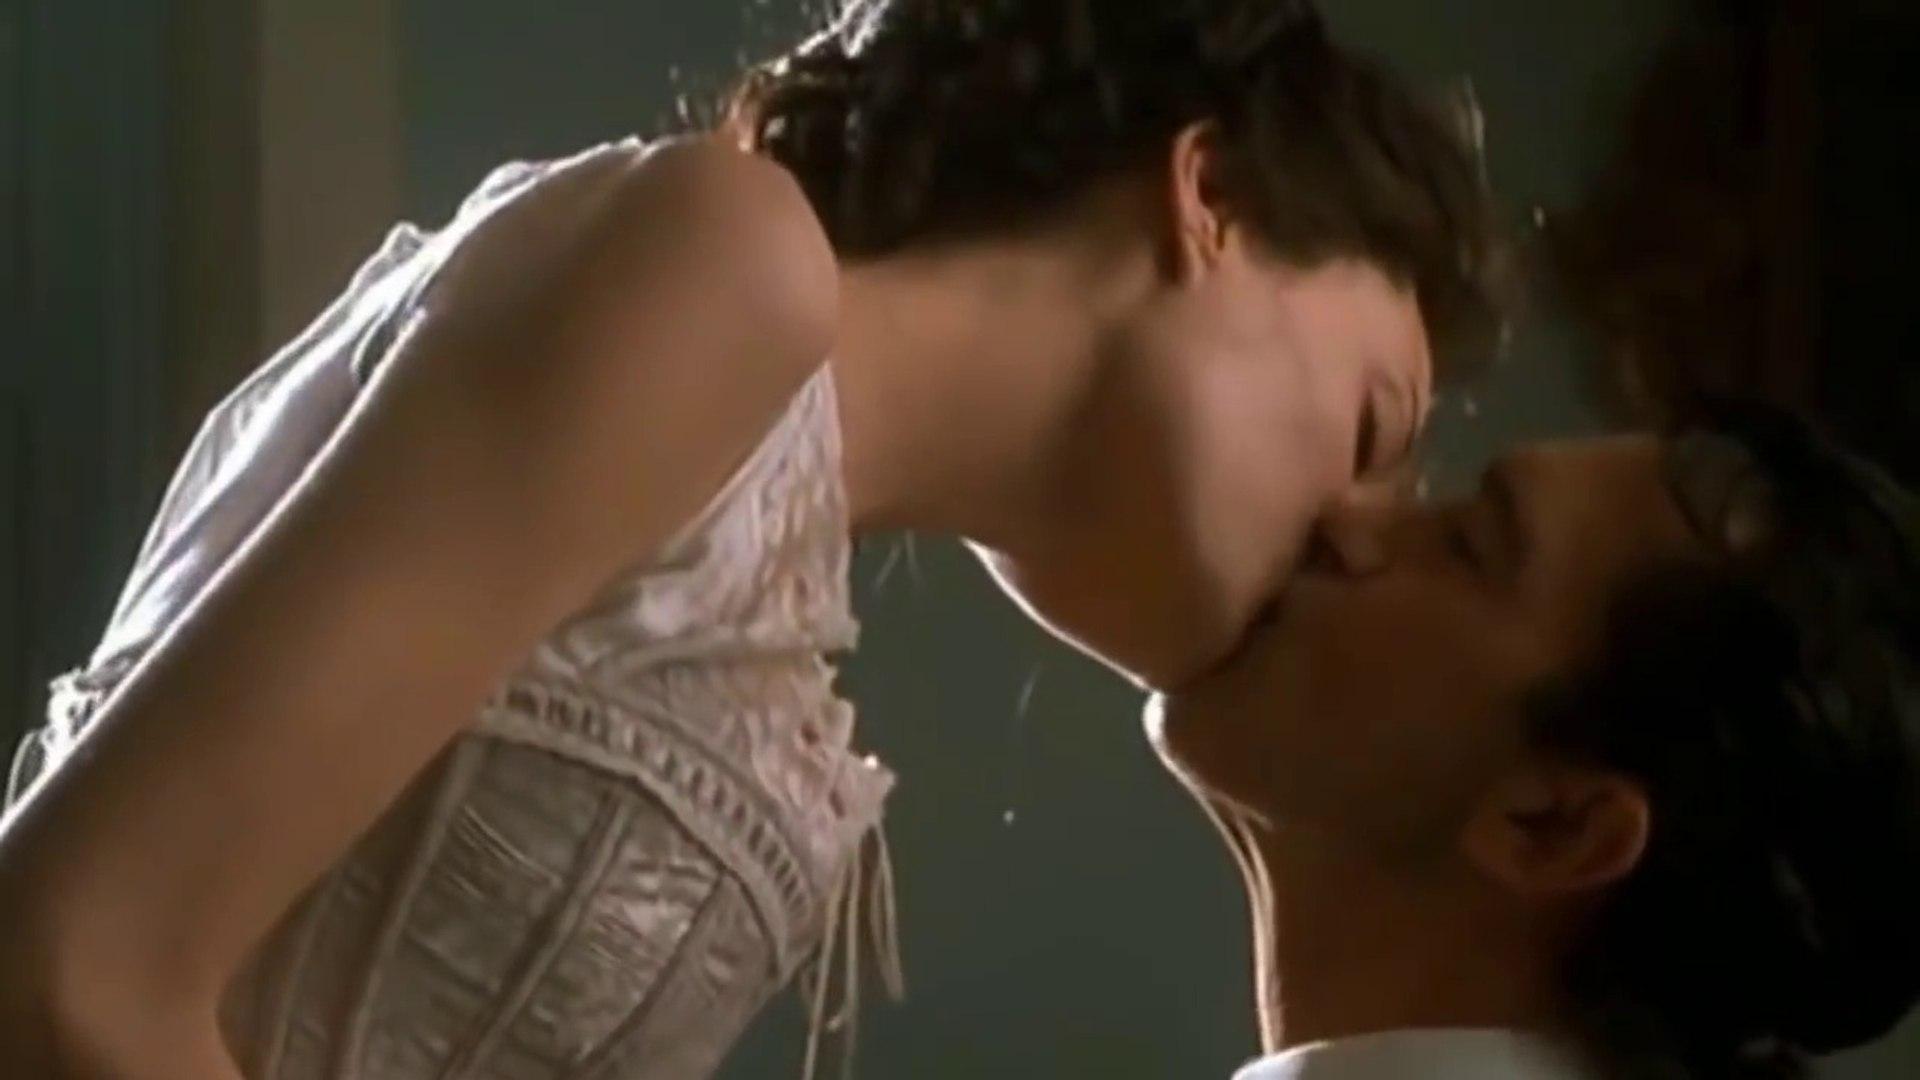 Angelina Jolie Naked Scene angelina jolie hot scenes and kisses - video dailymotion